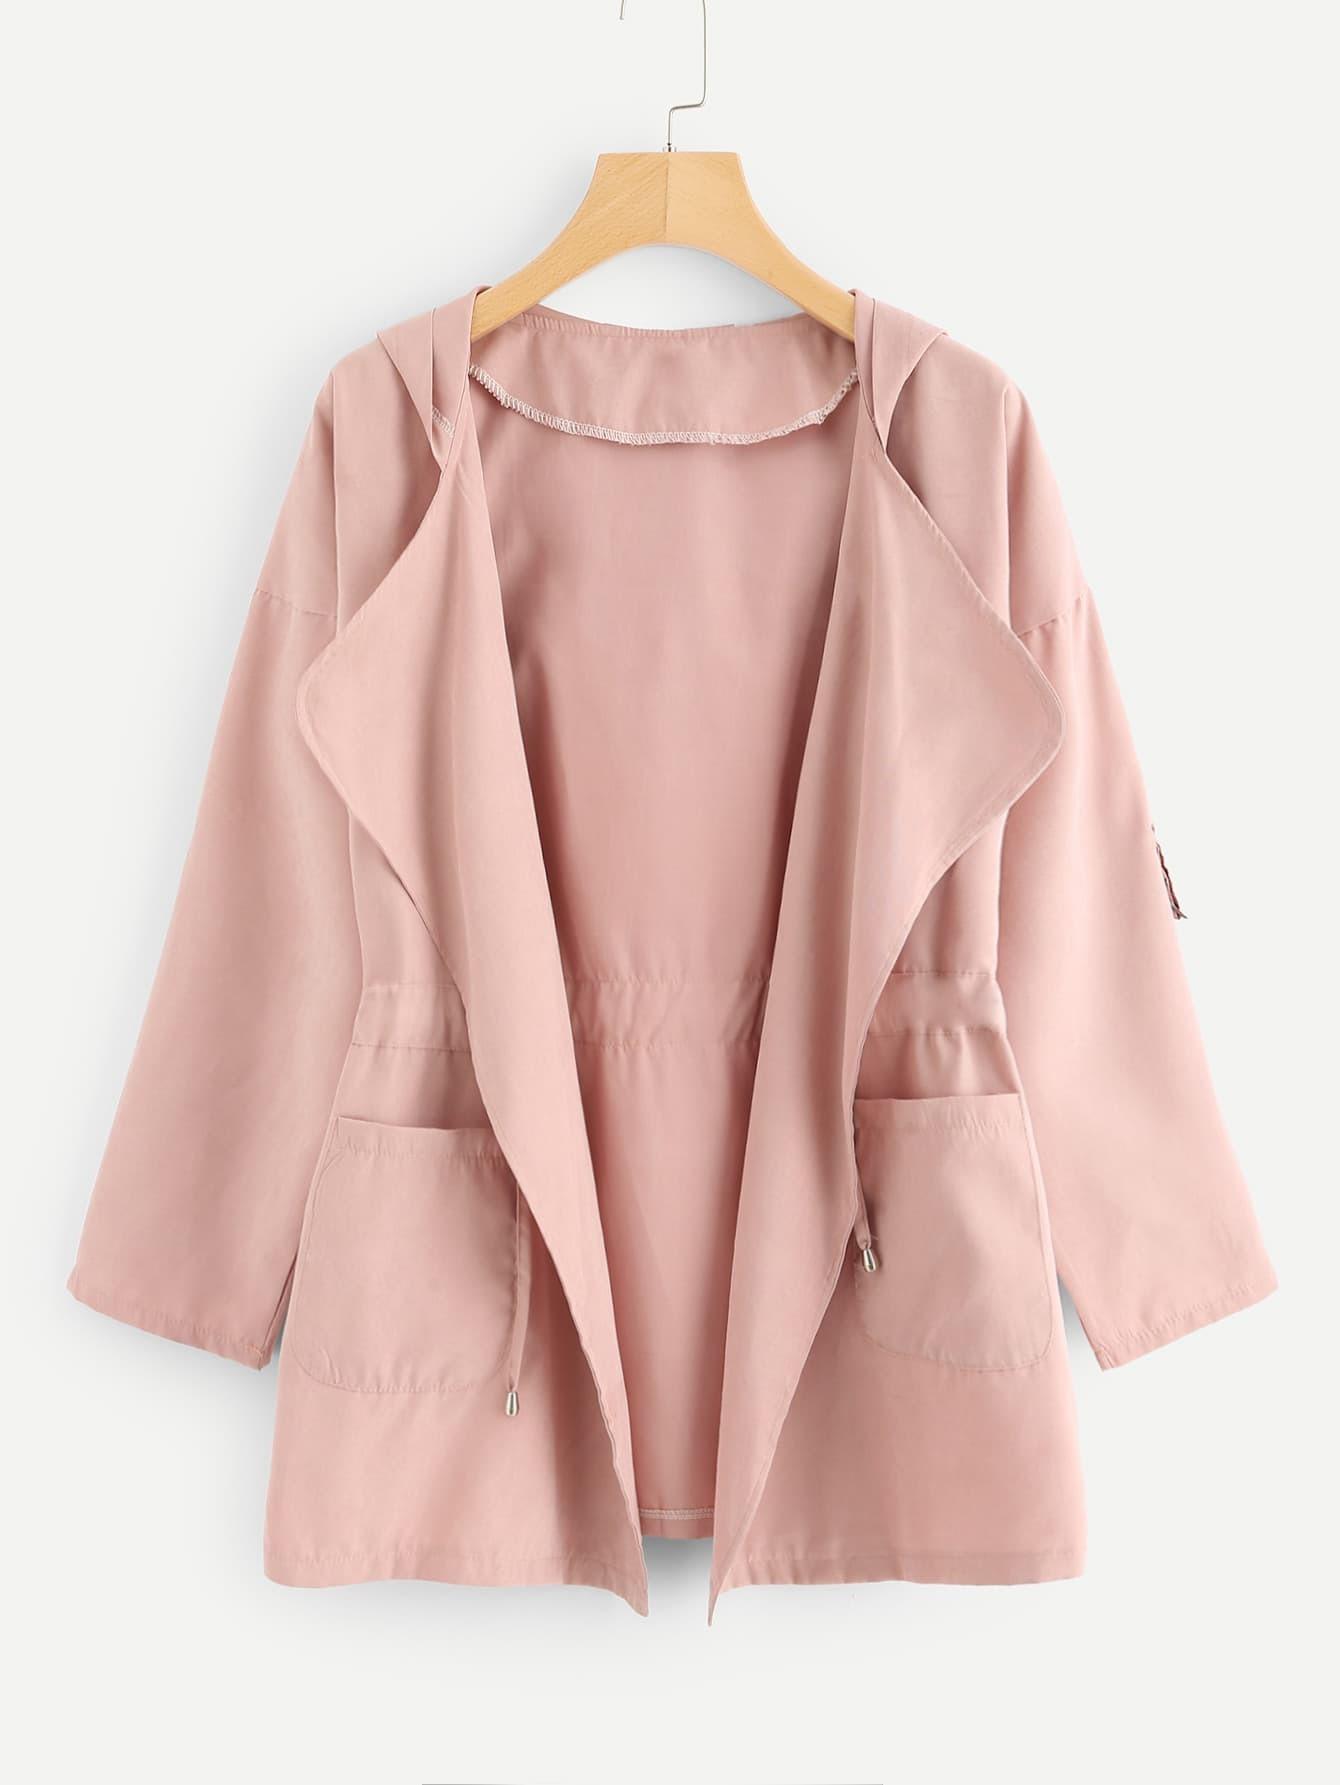 Dual Pocket Drawstring Waist Hooded Coat